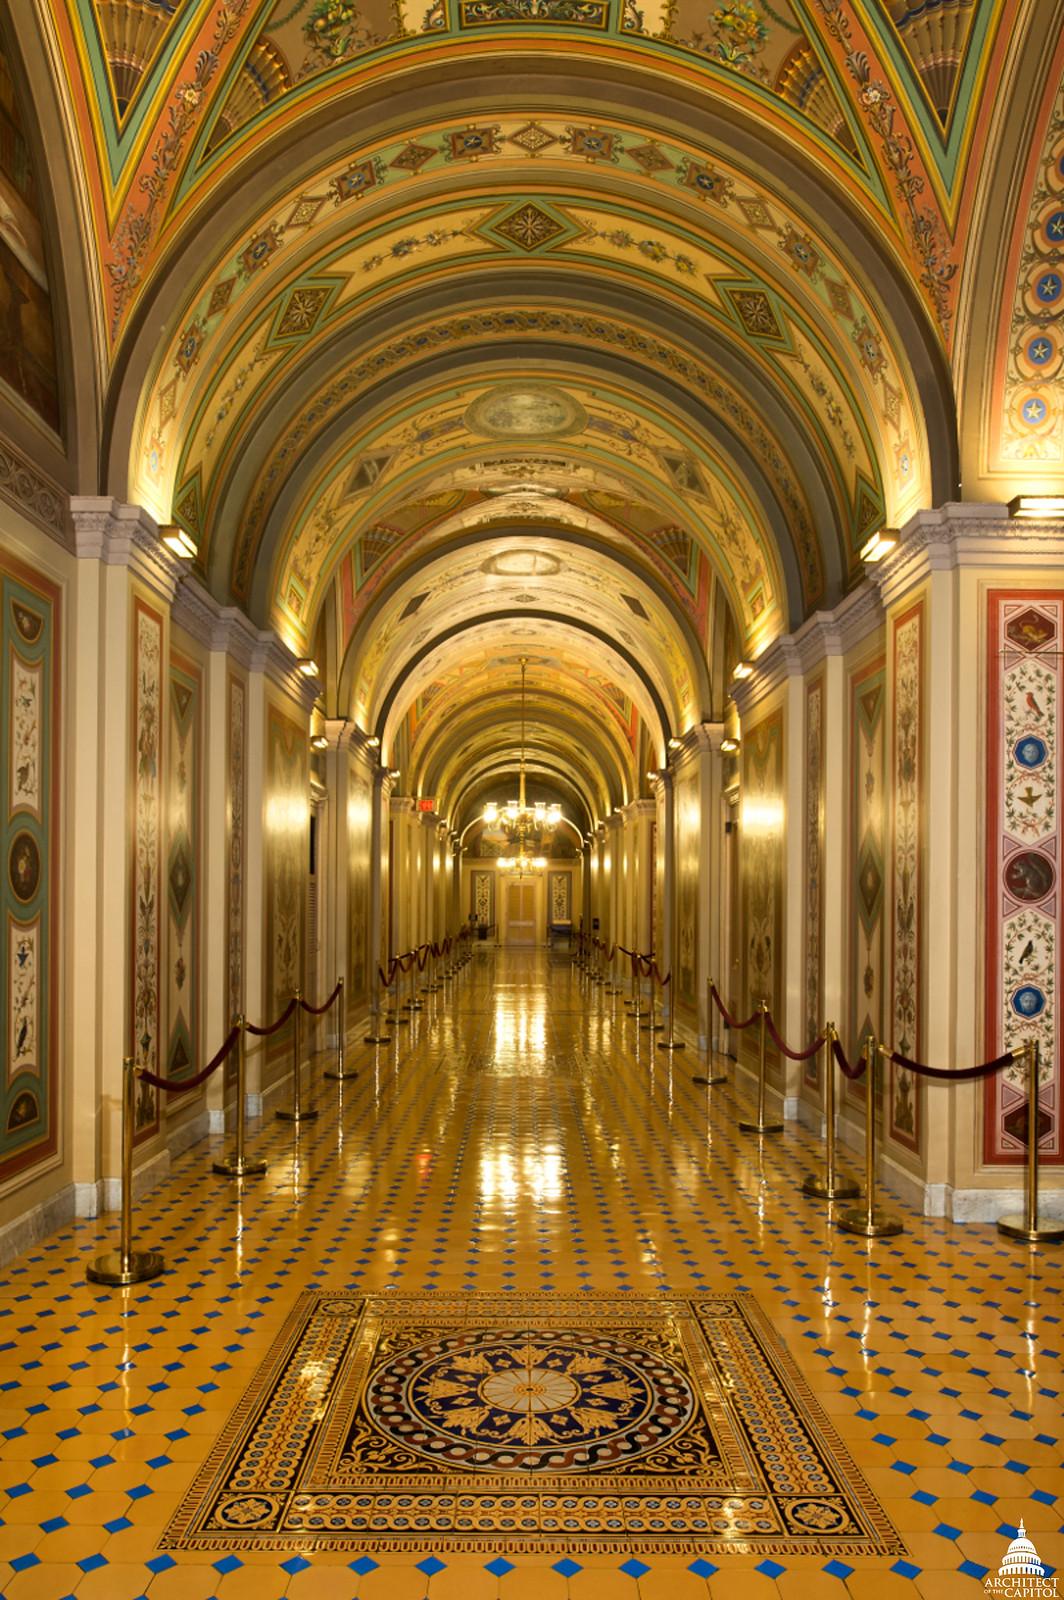 Brumidi Corridors Architect Of The Capitol United